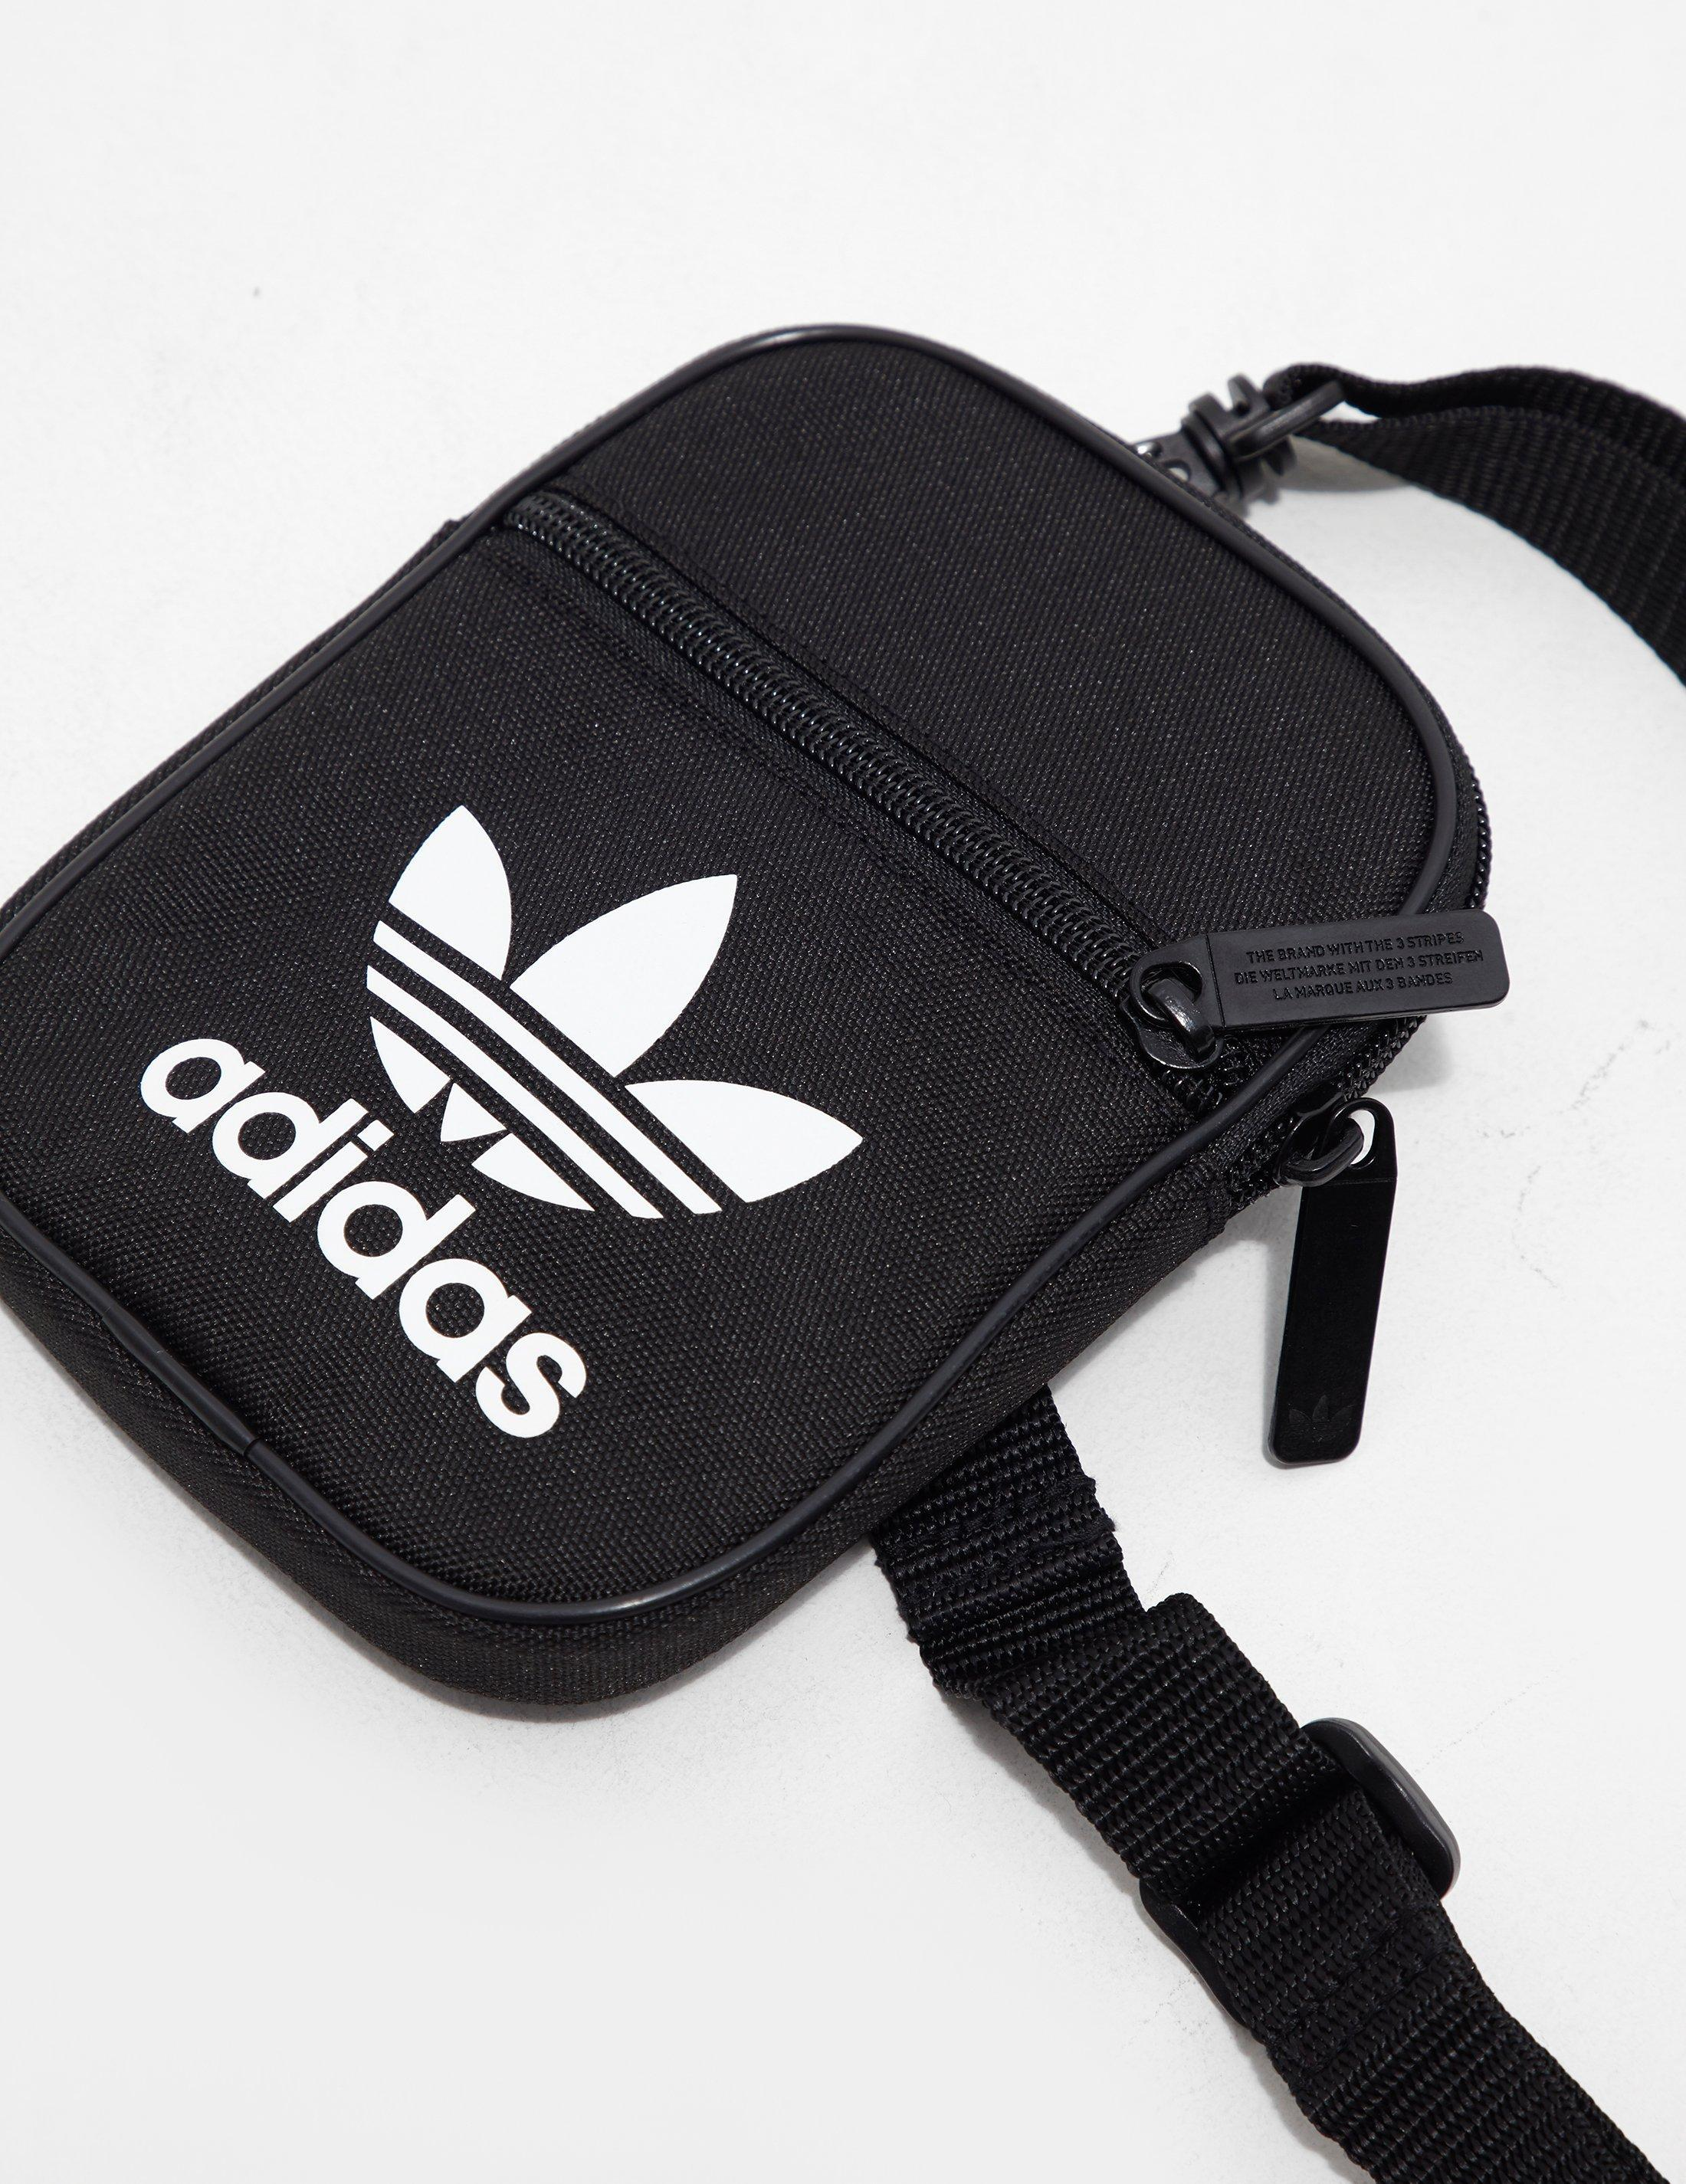 38267d6245b6 Lyst - adidas Originals Mens Trefoil Festival Bag Black white in ...